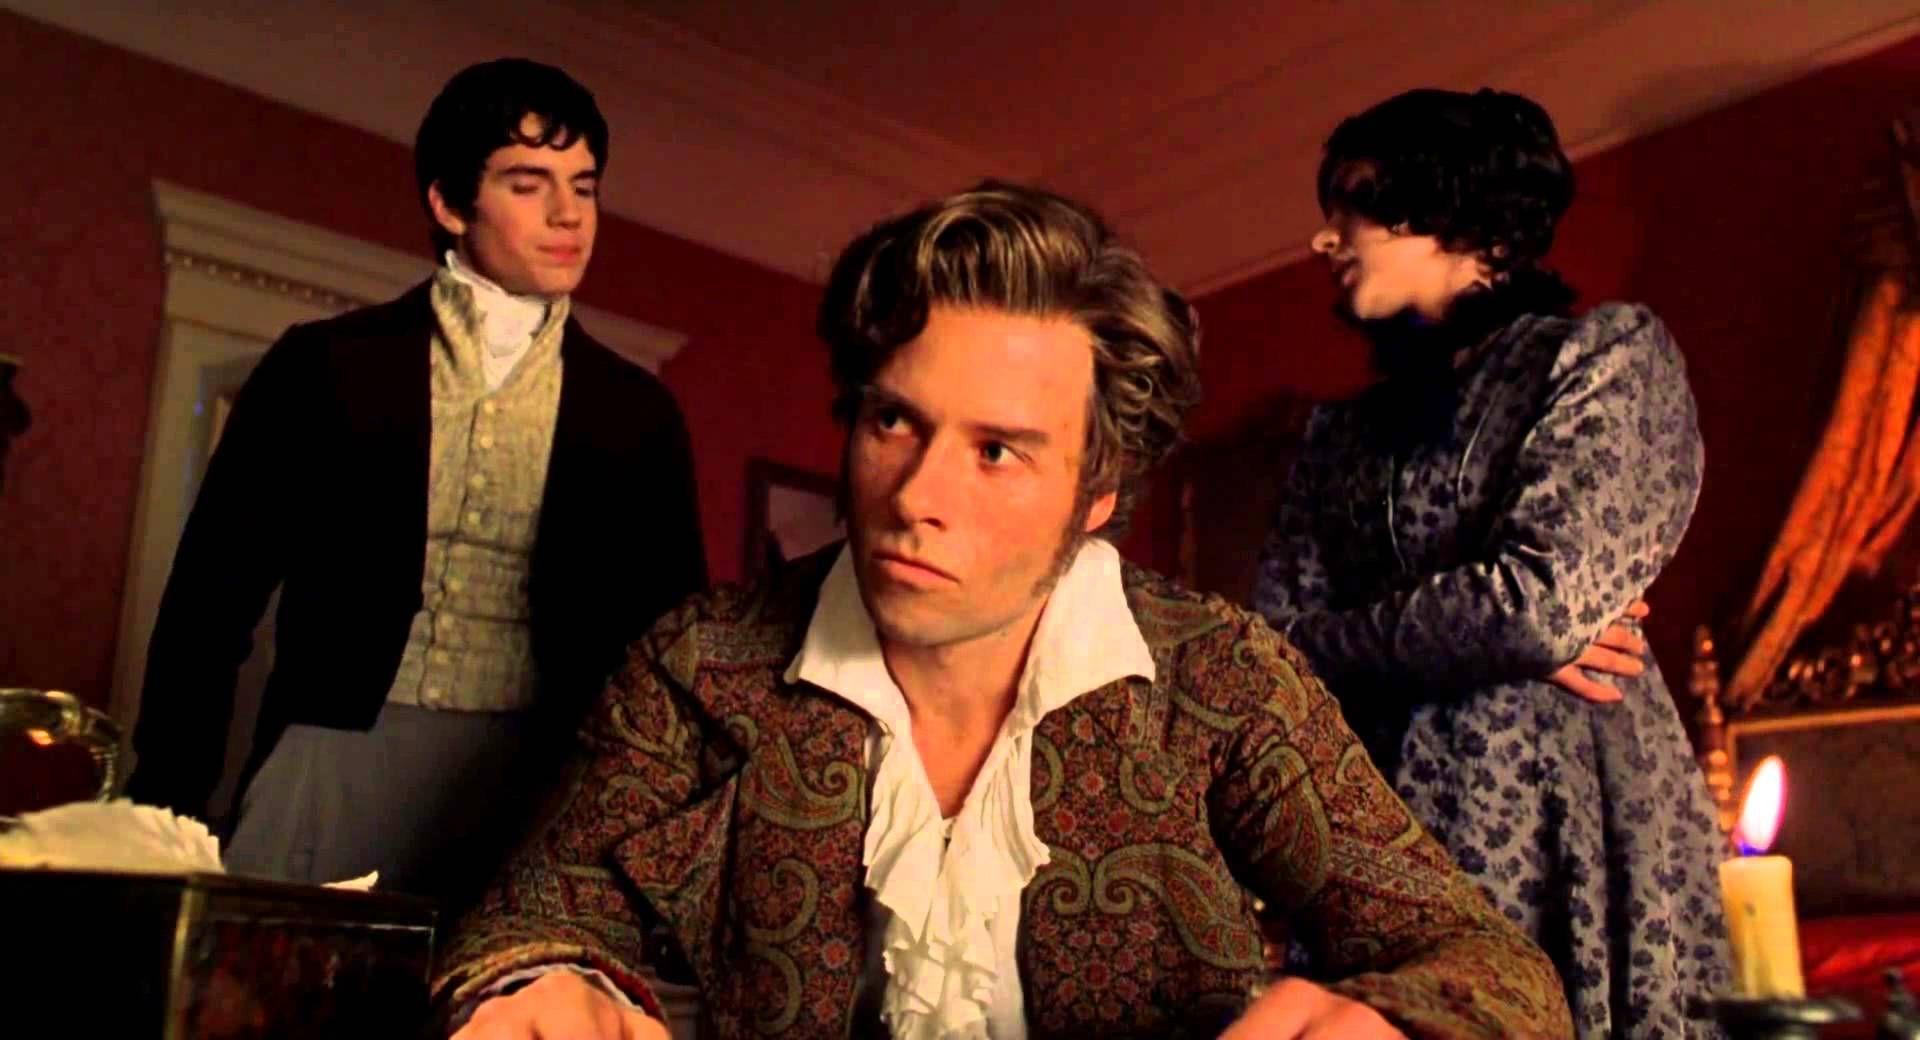 10 лучших ролей Гая Пирса 9. Граф Монте-Кристо (The Count of Monte Cristo) 2002